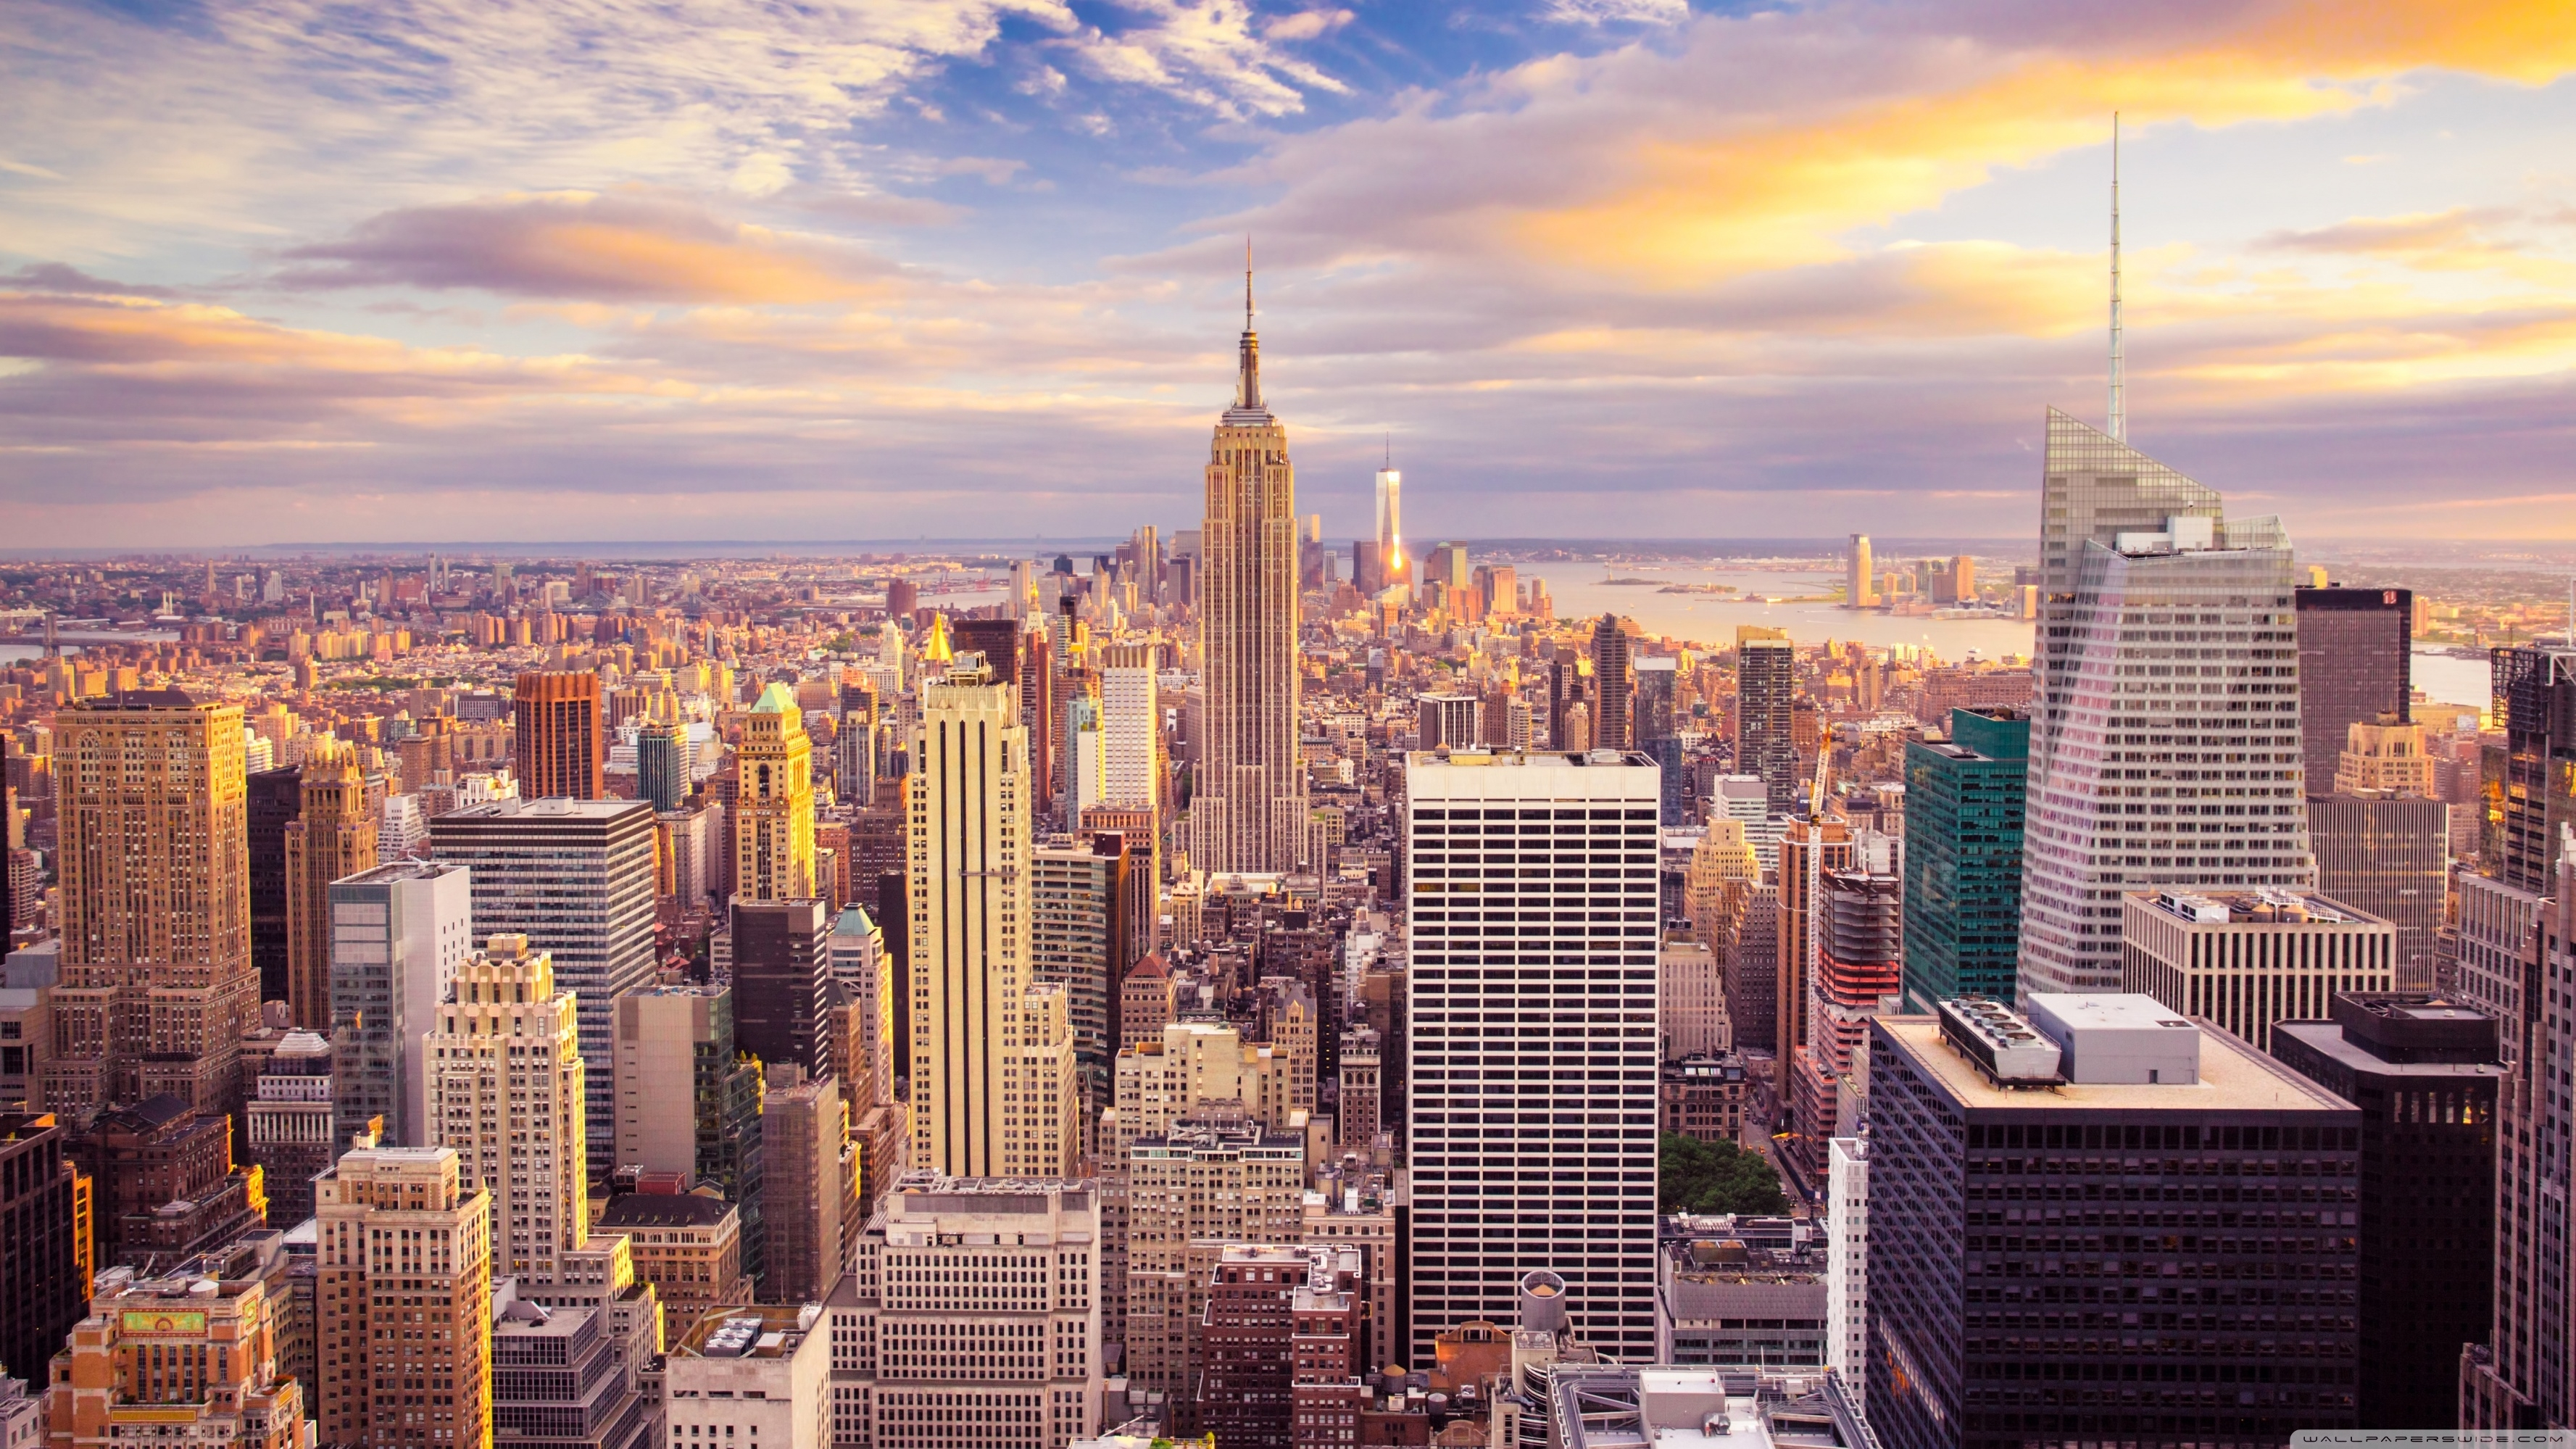 new york city buildings ❤ 4k hd desktop wallpaper for 4k ultra hd